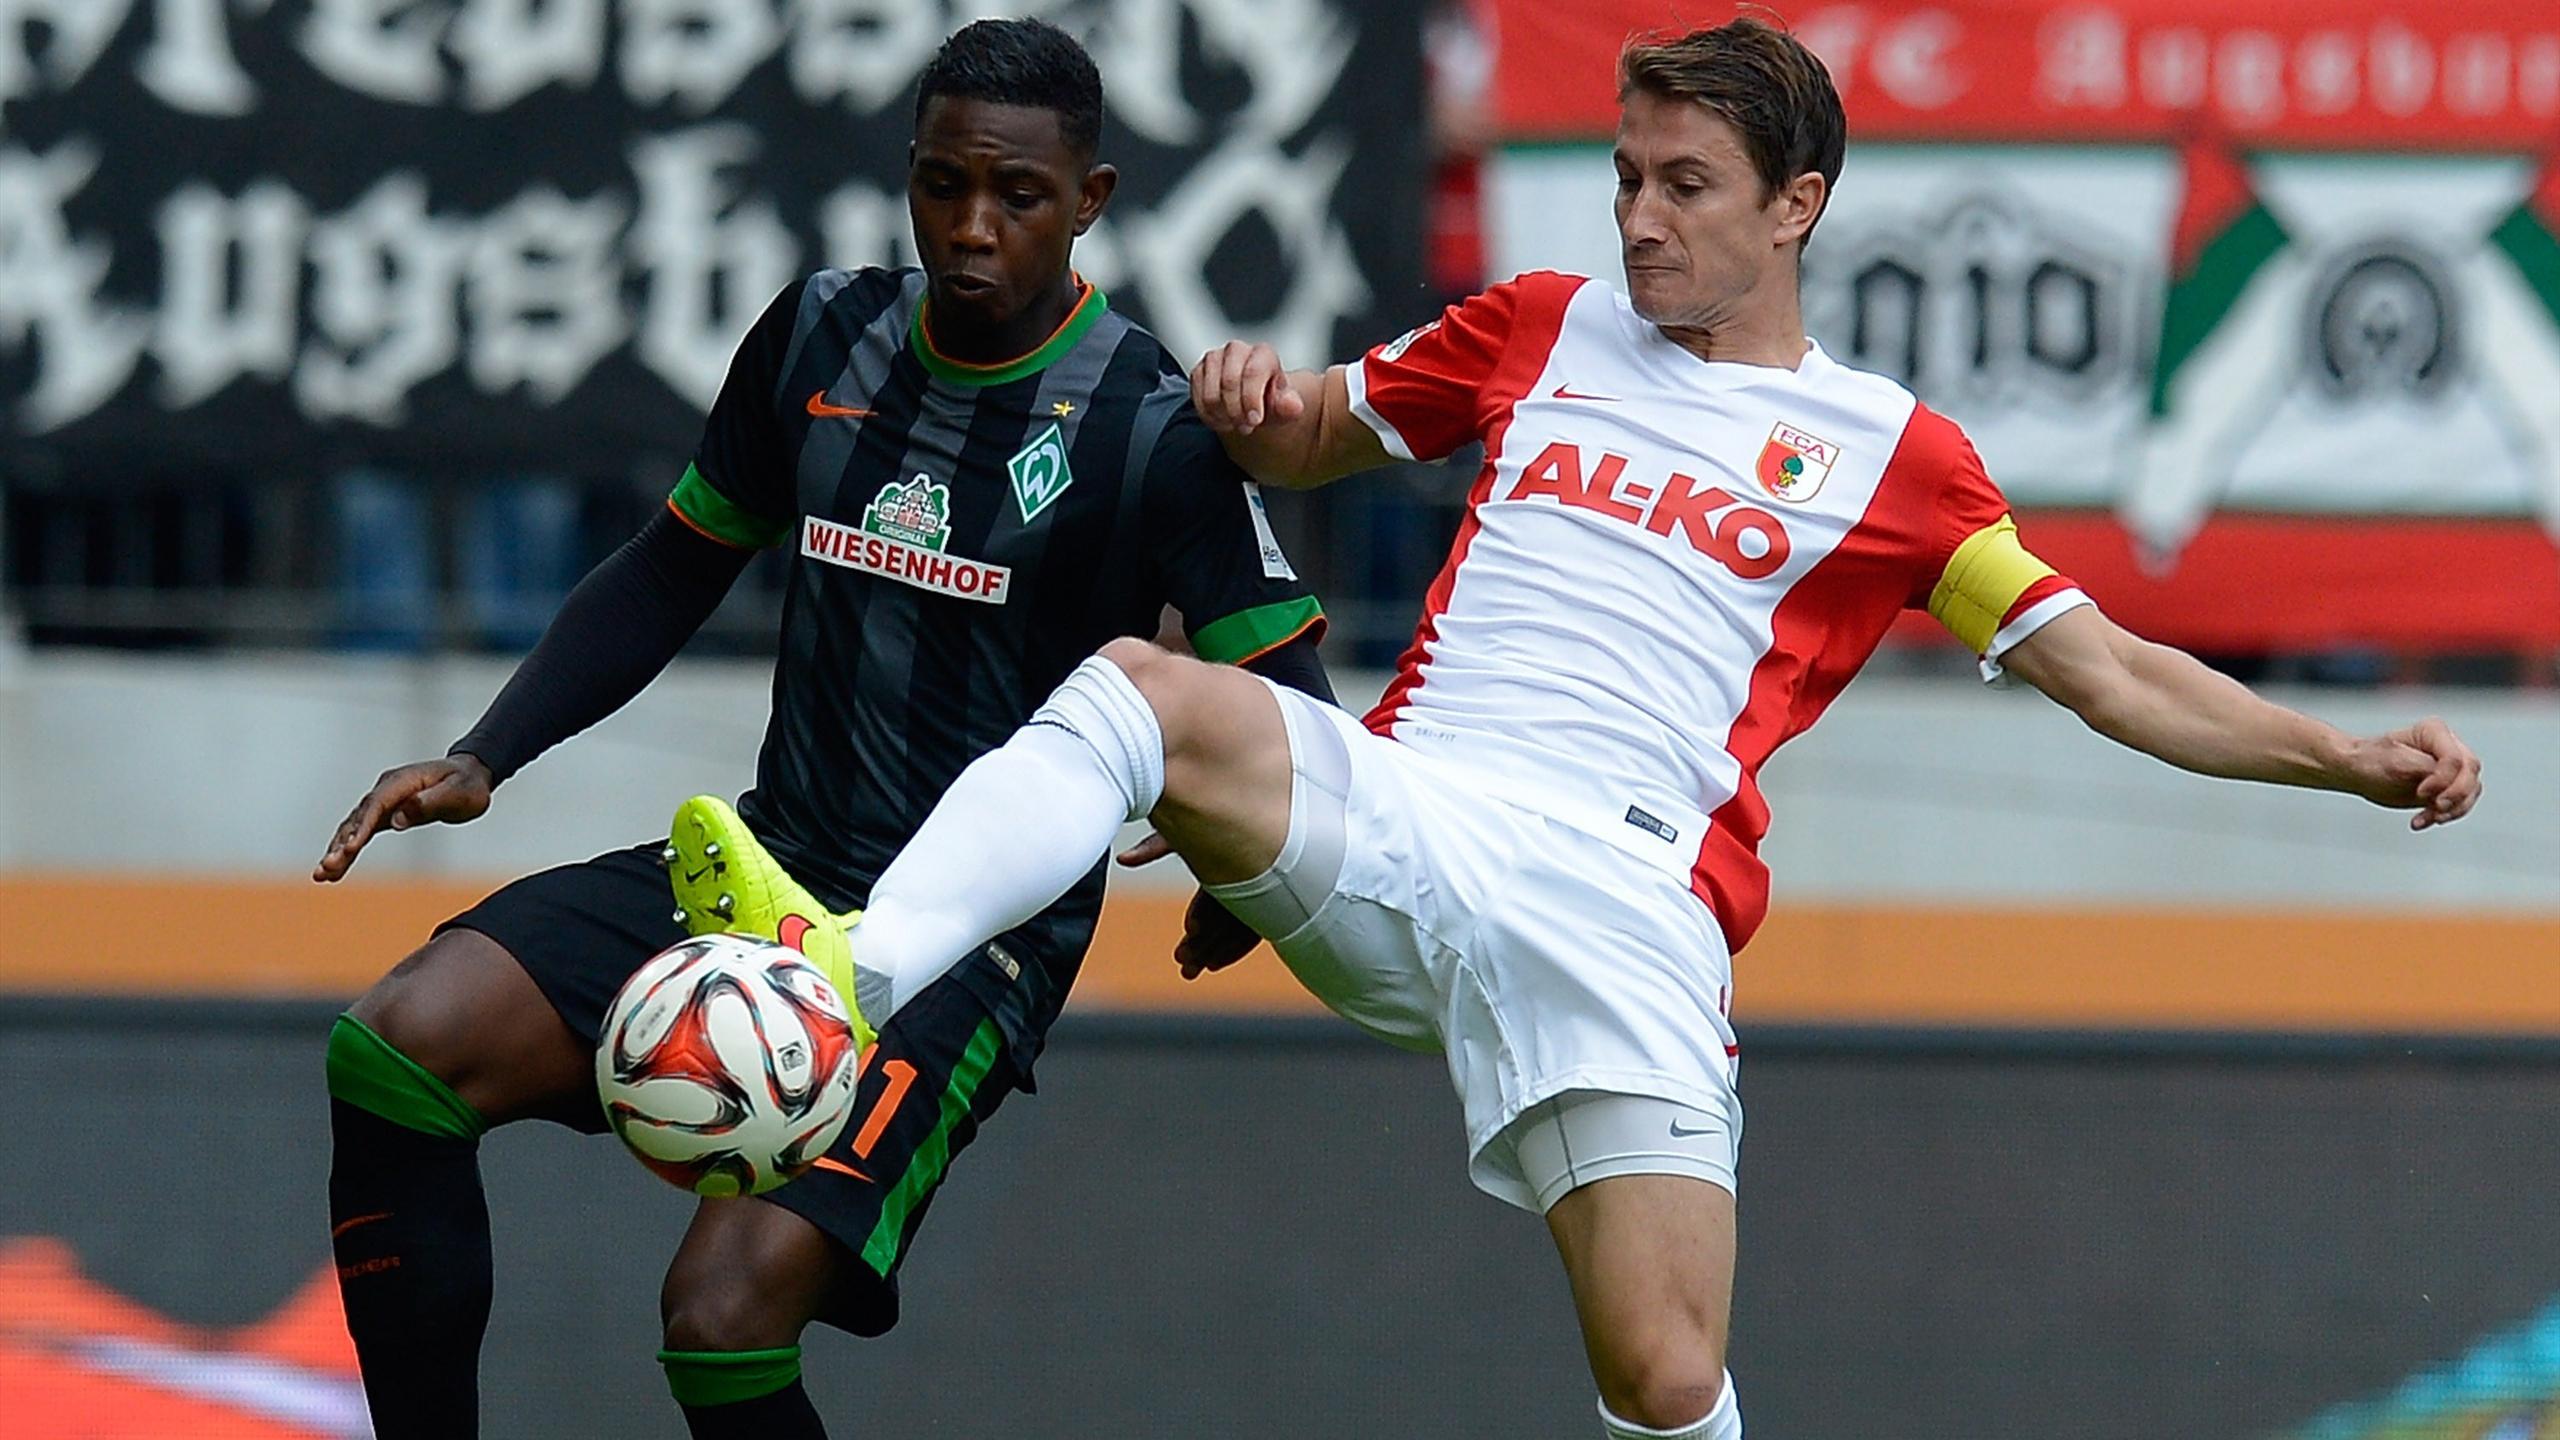 Video: Augsburg vs Werder Bremen